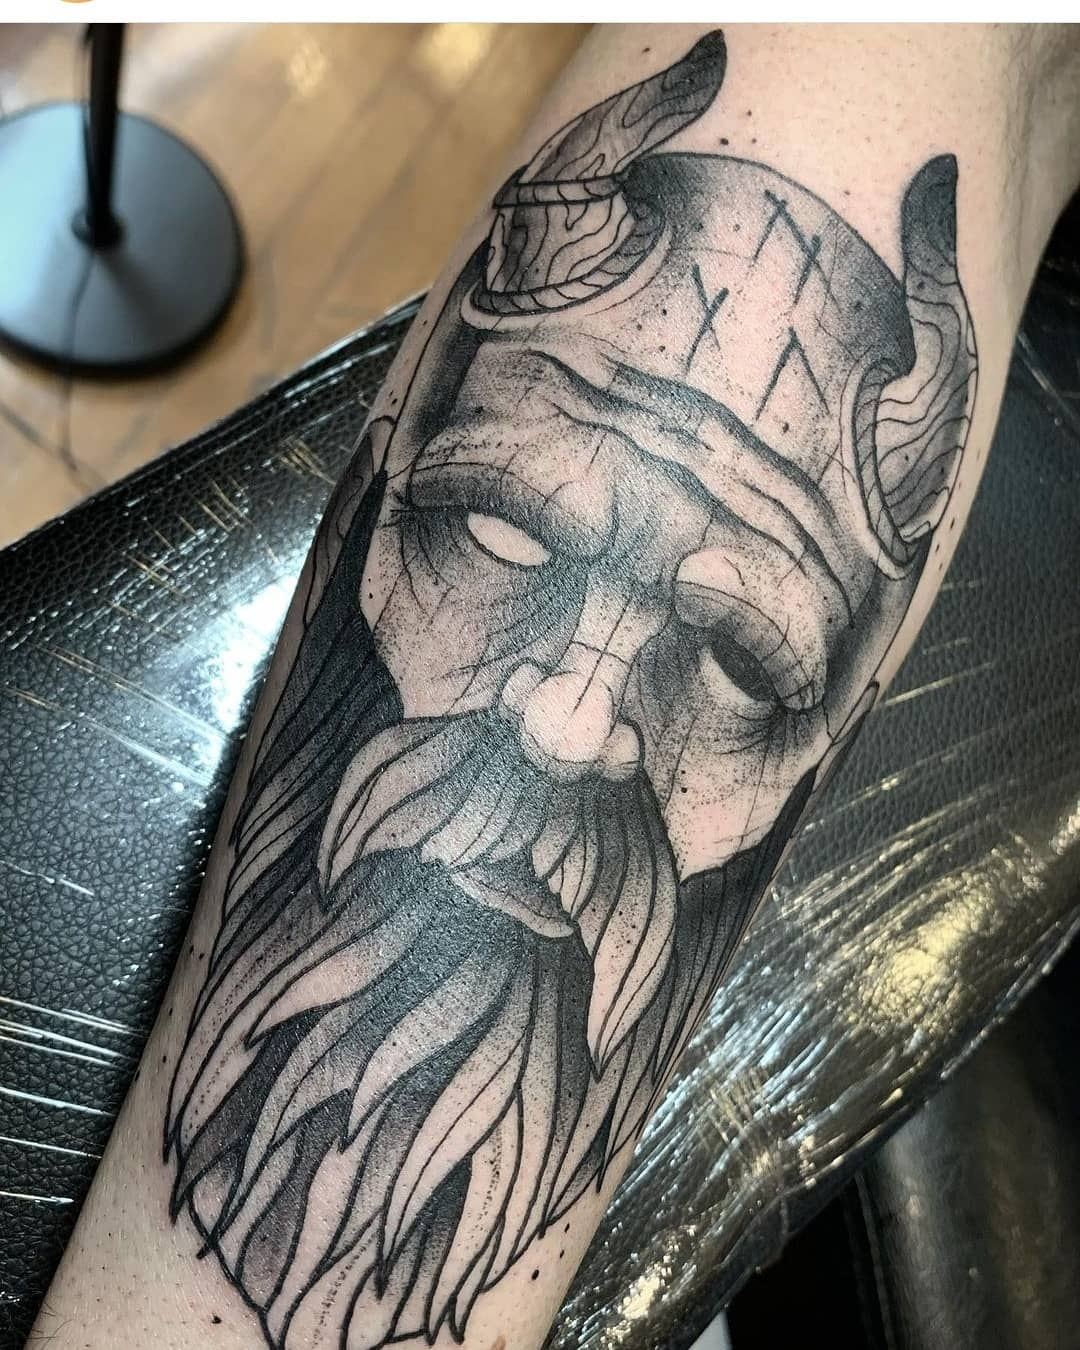 Mimir Norse god of knowledge by Chico Lou's Fine Tattoos studio in Athens Georgia GA. Artist - Darya Kalantari